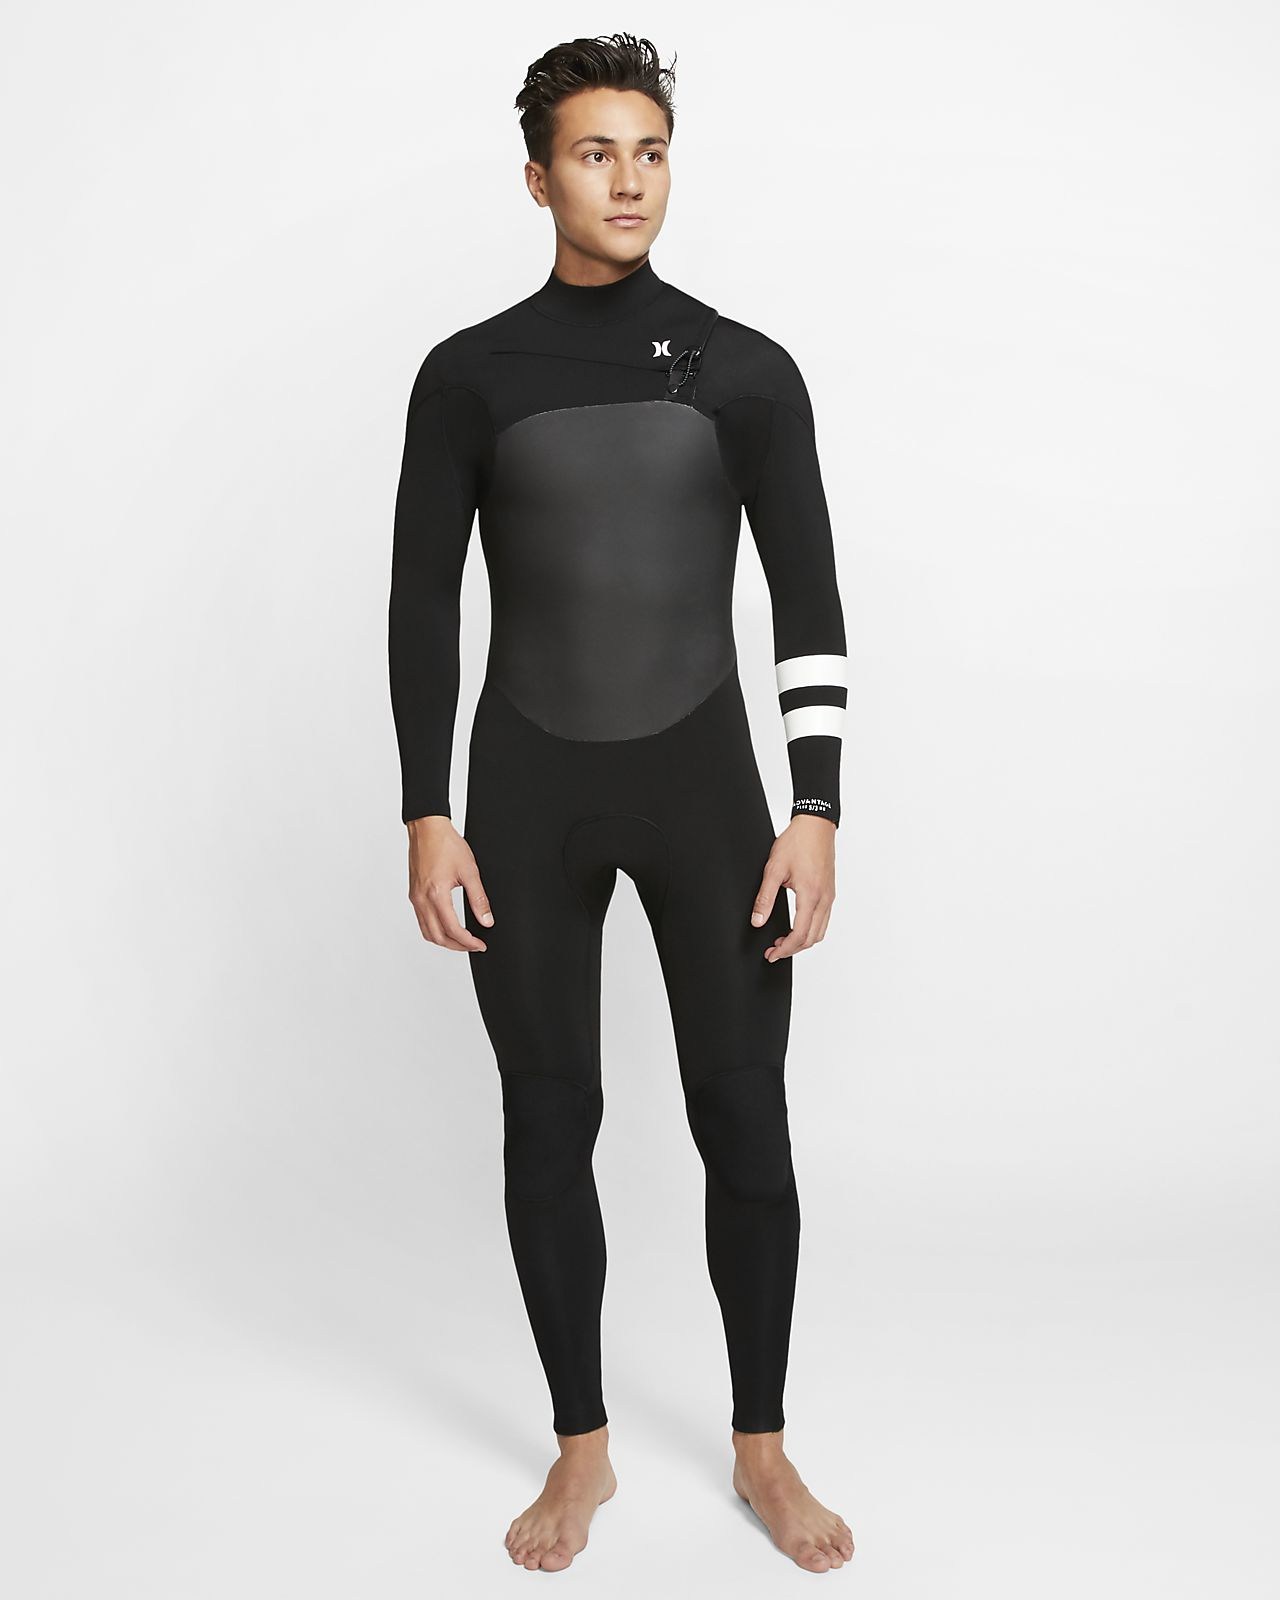 Hurley Advantage Plus 5/3 Fullsuit Erkek Wetsuit'i